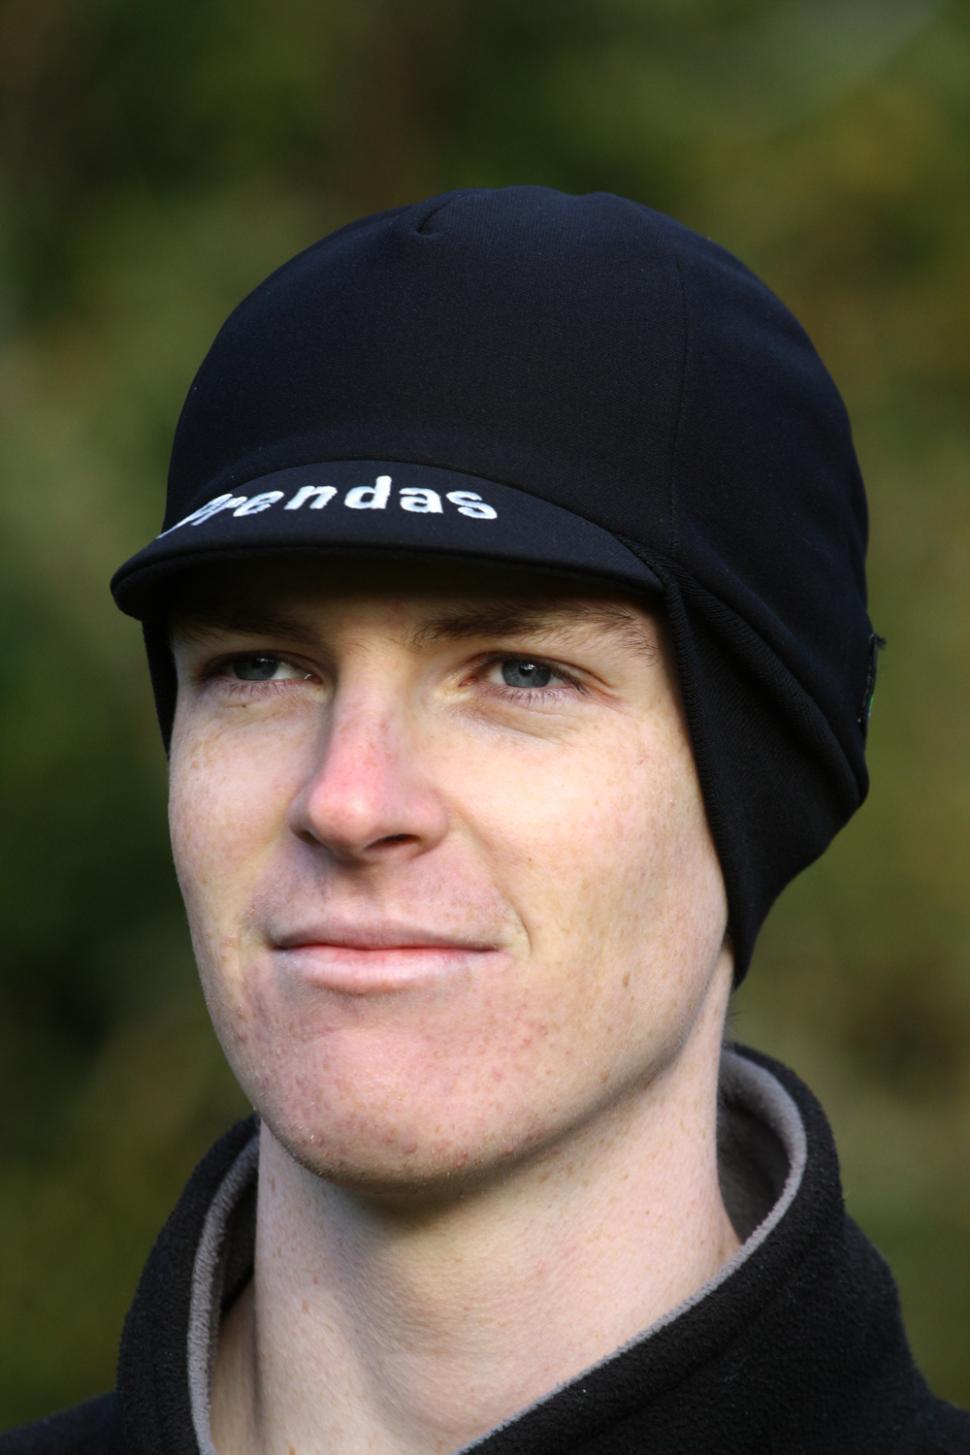 Prendas Ciclismo Belgian-style Winter Hat